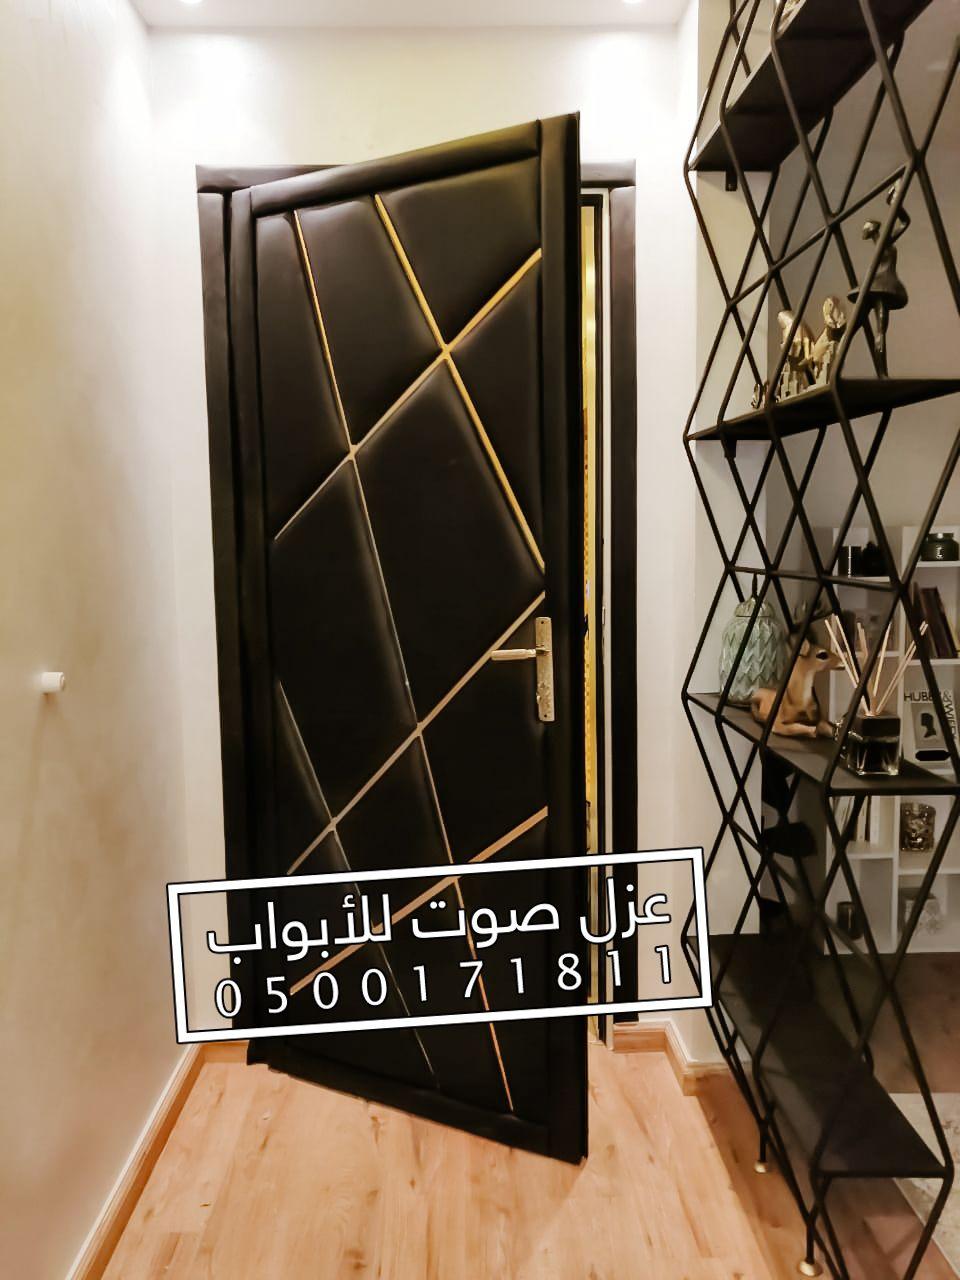 عازل الباب بالرياض Home Decor Decals Home Decor Decor